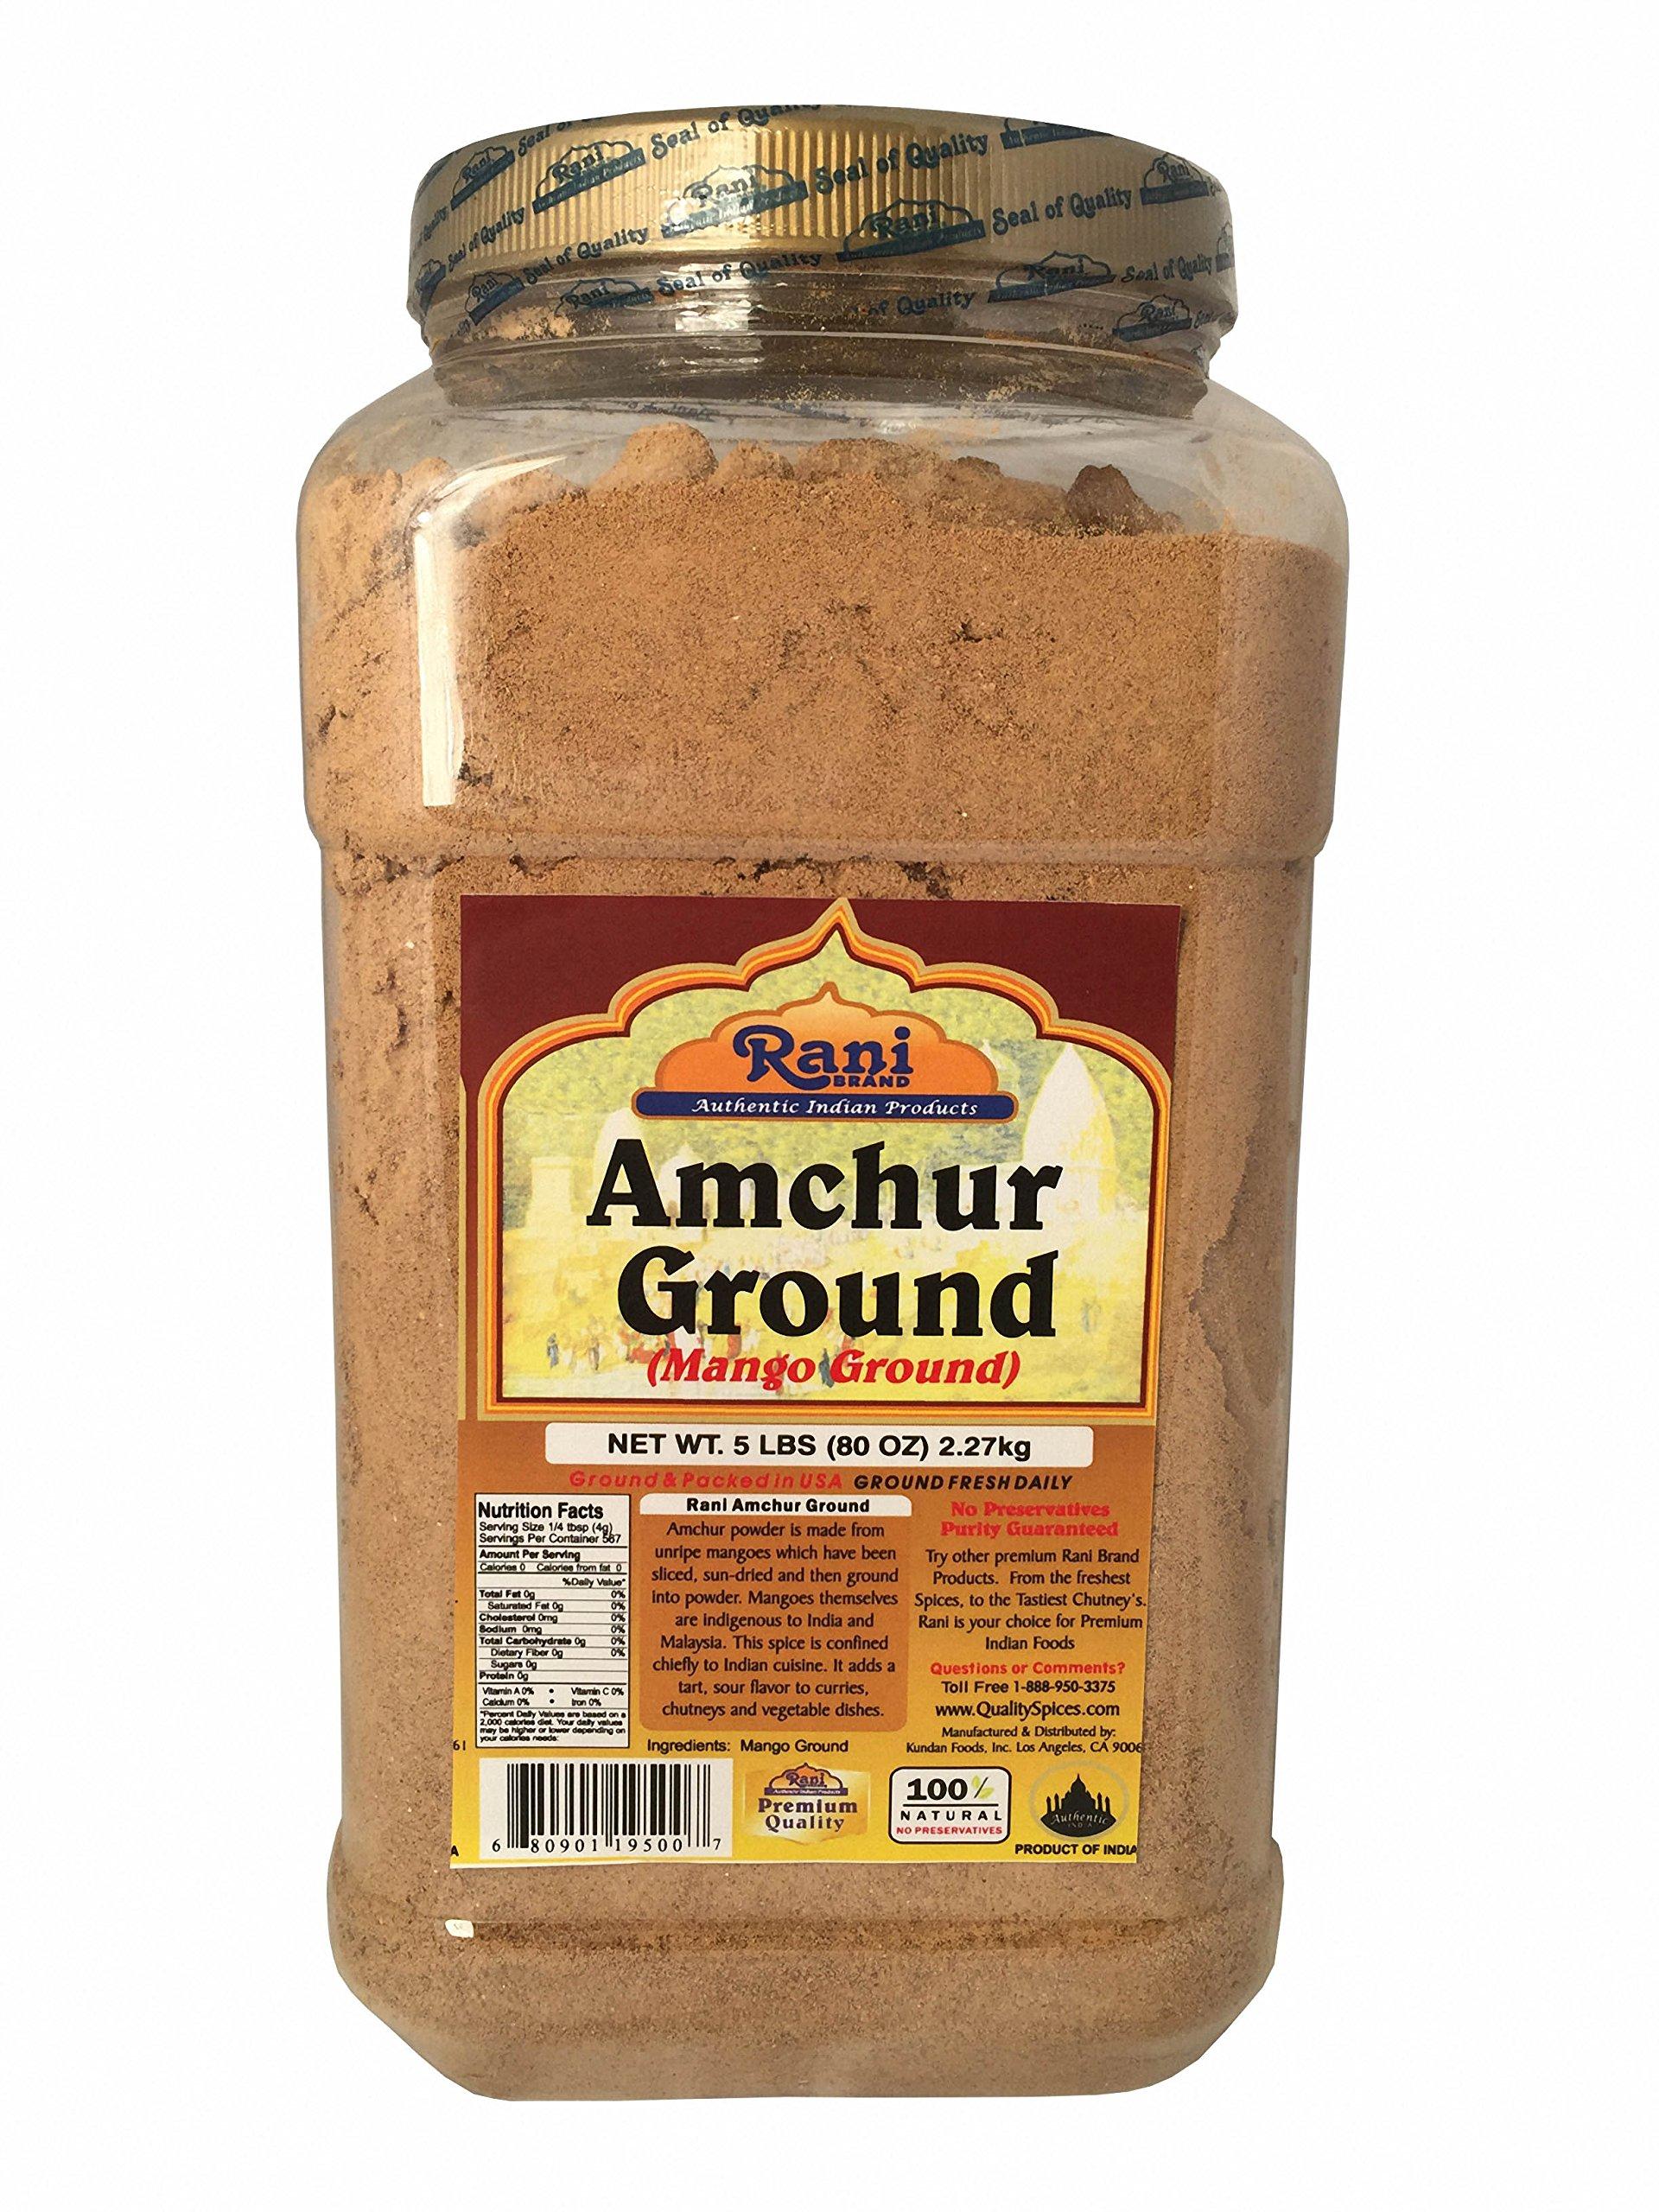 Rani Amchur (Mango) Ground 5lbs (80oz) Bulk, PET Jar ~ All Natural, Indian Origin   No Color   Gluten Free Ingredients   Vegan   NON-GMO   No Salt or fillers by Rani Brand Authentic Indian Products